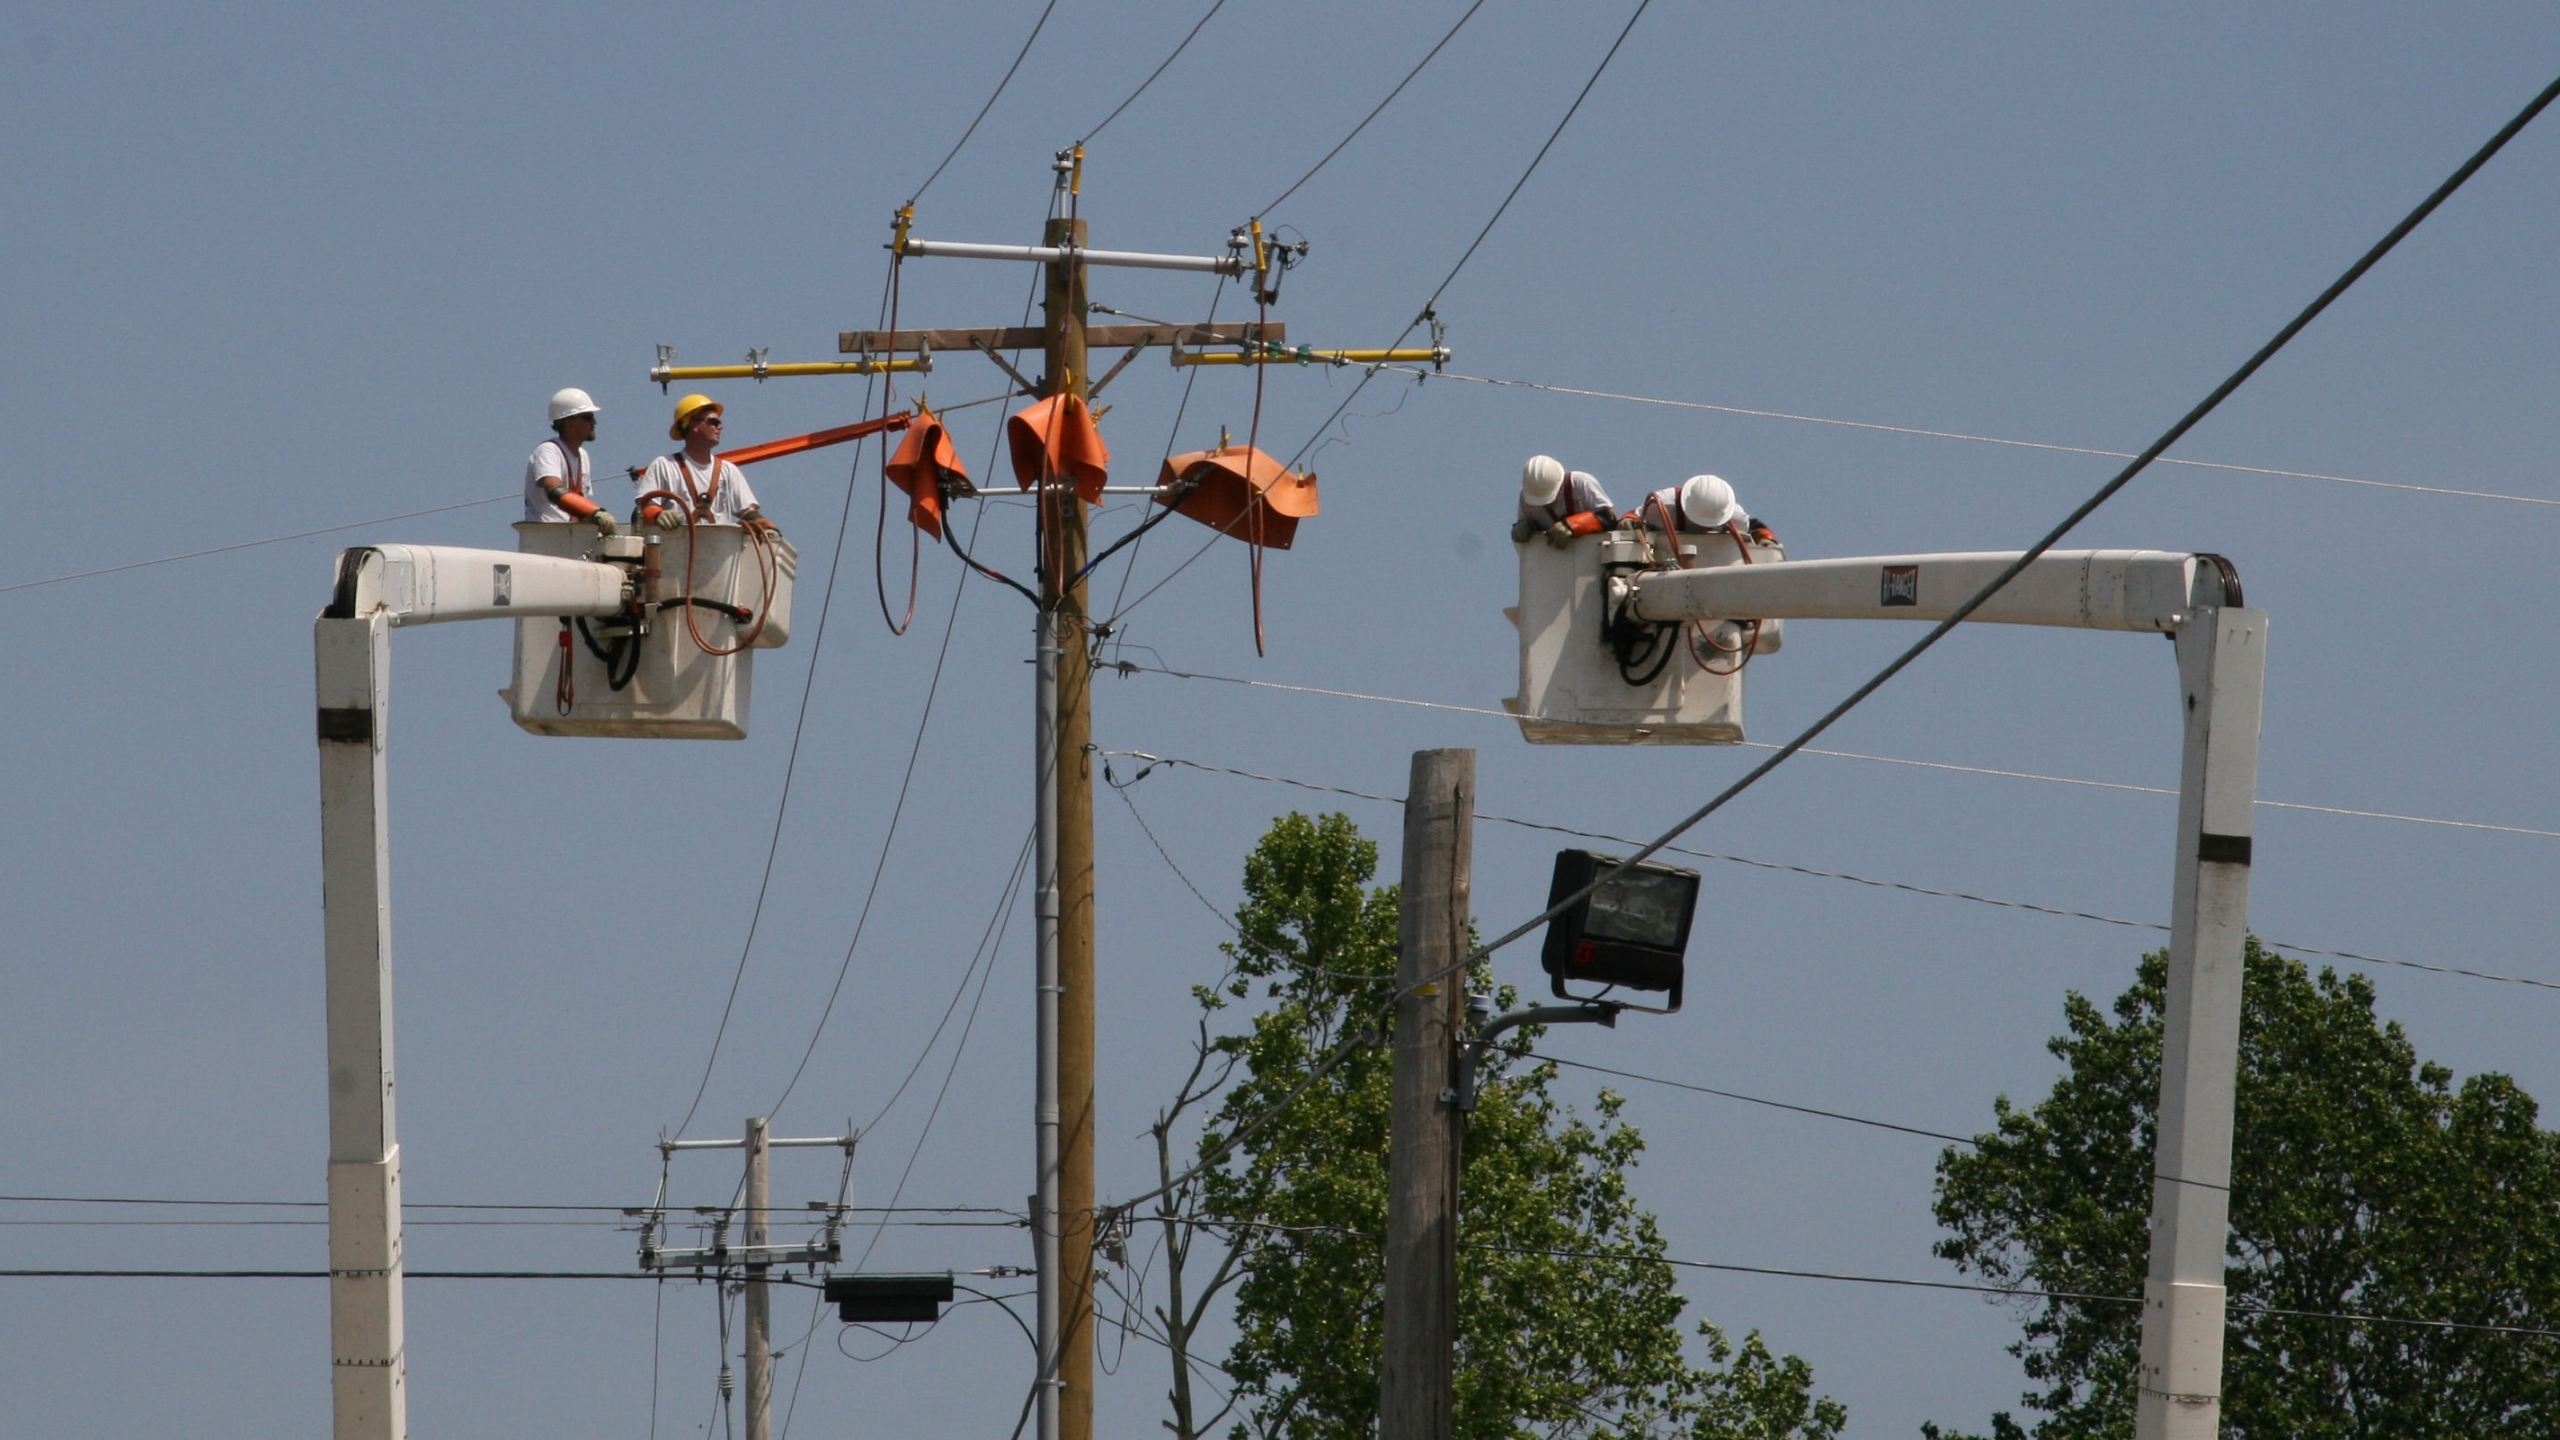 Power Line Repair Linemen Restoration Generic_123850